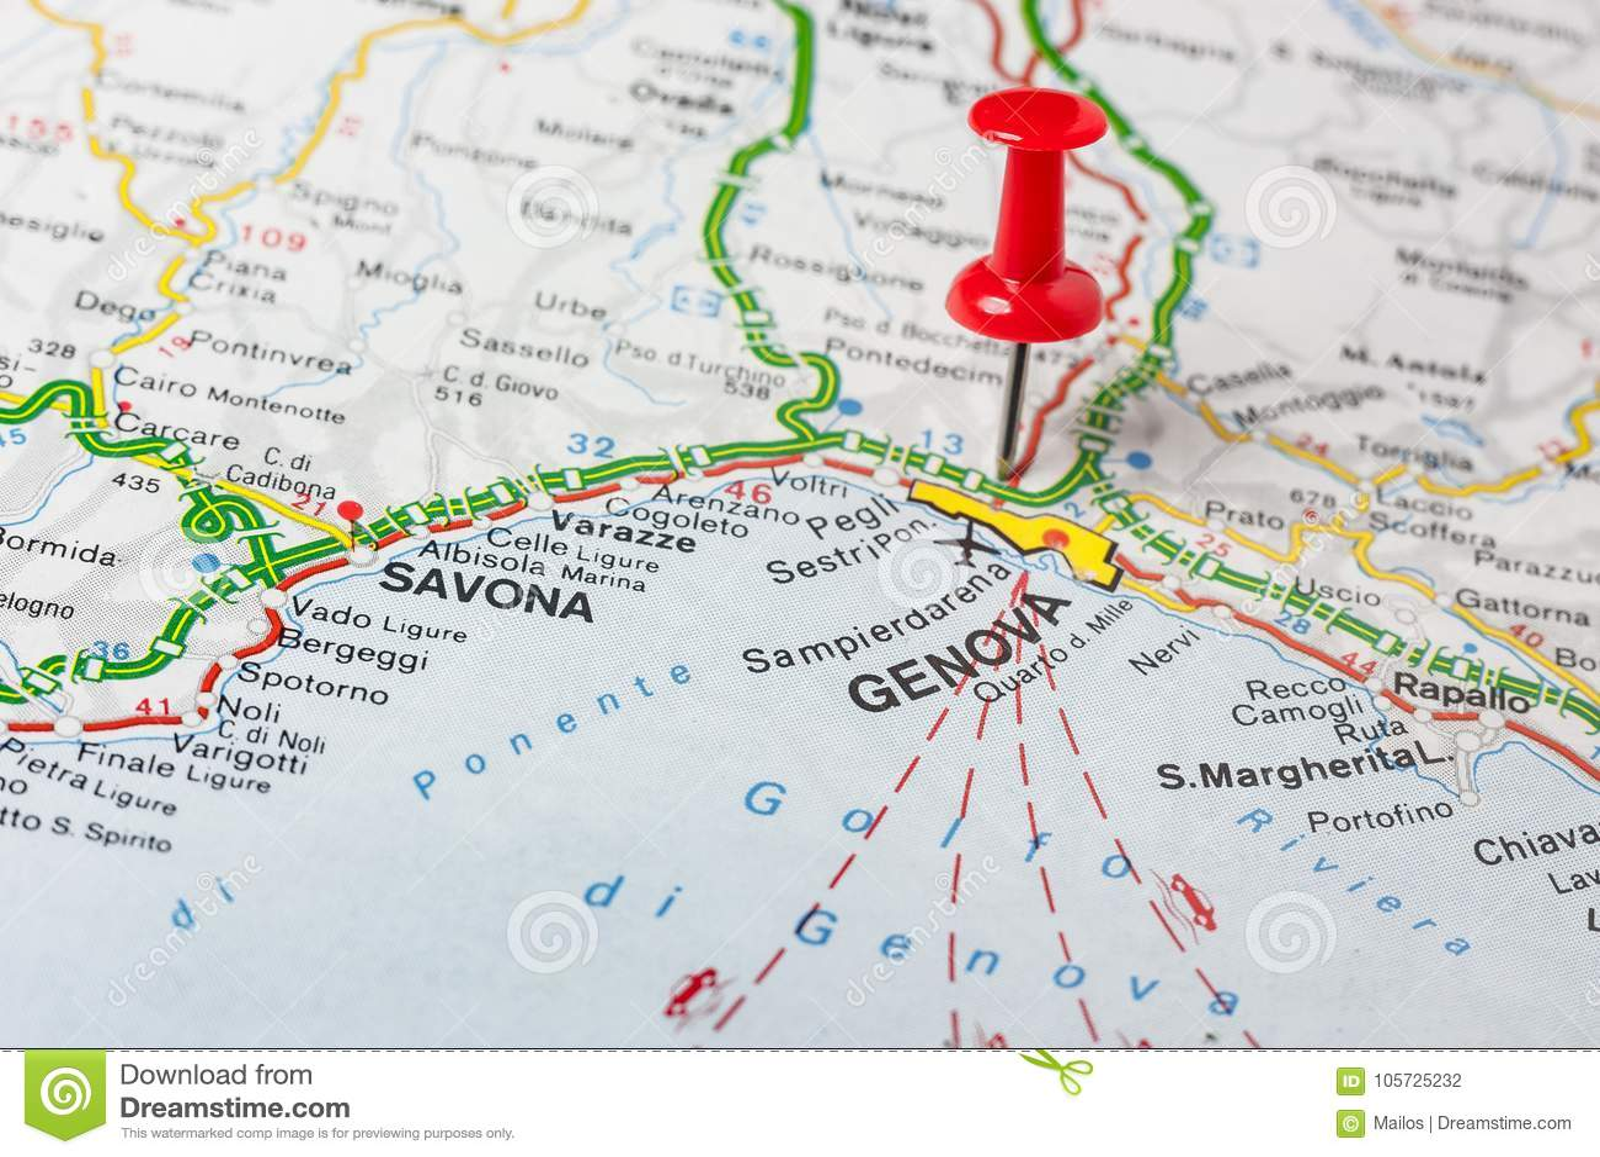 Genova Pinned On A Map Of Italy Stock Photo Image Of Italy City